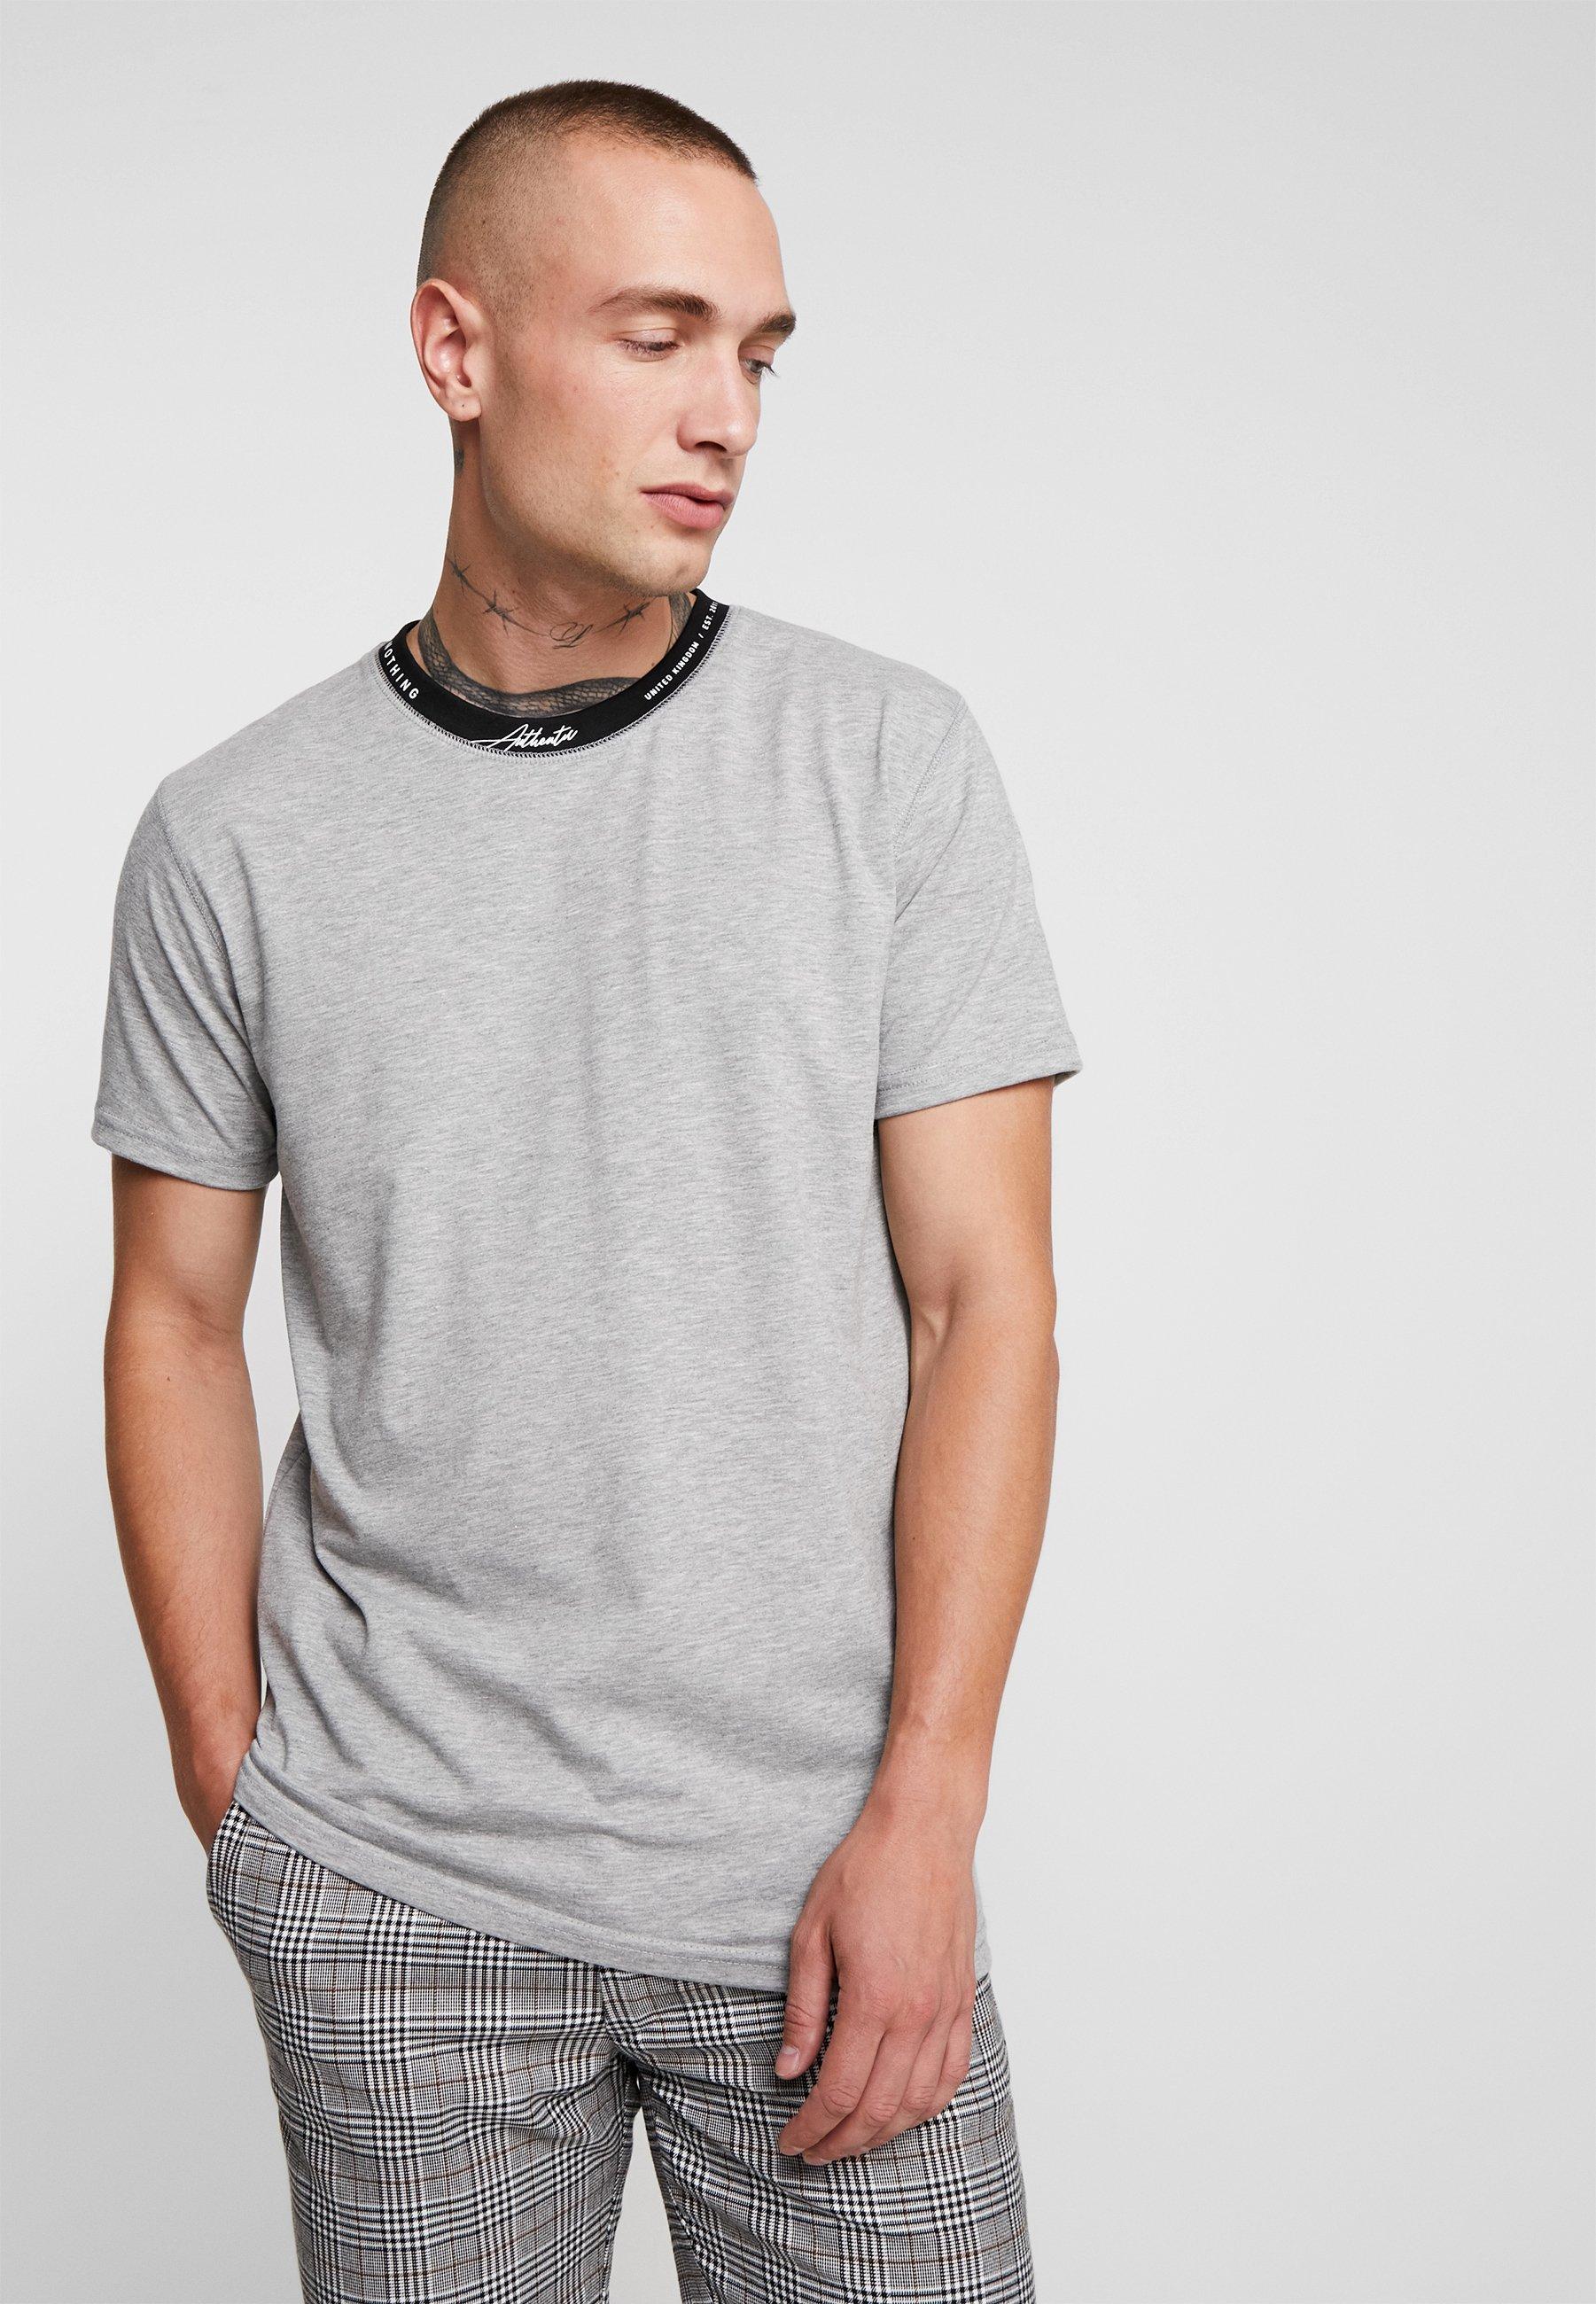 Grey Neck Good Nothing For shirt Authentic Basique BrandingT g7bfyY6